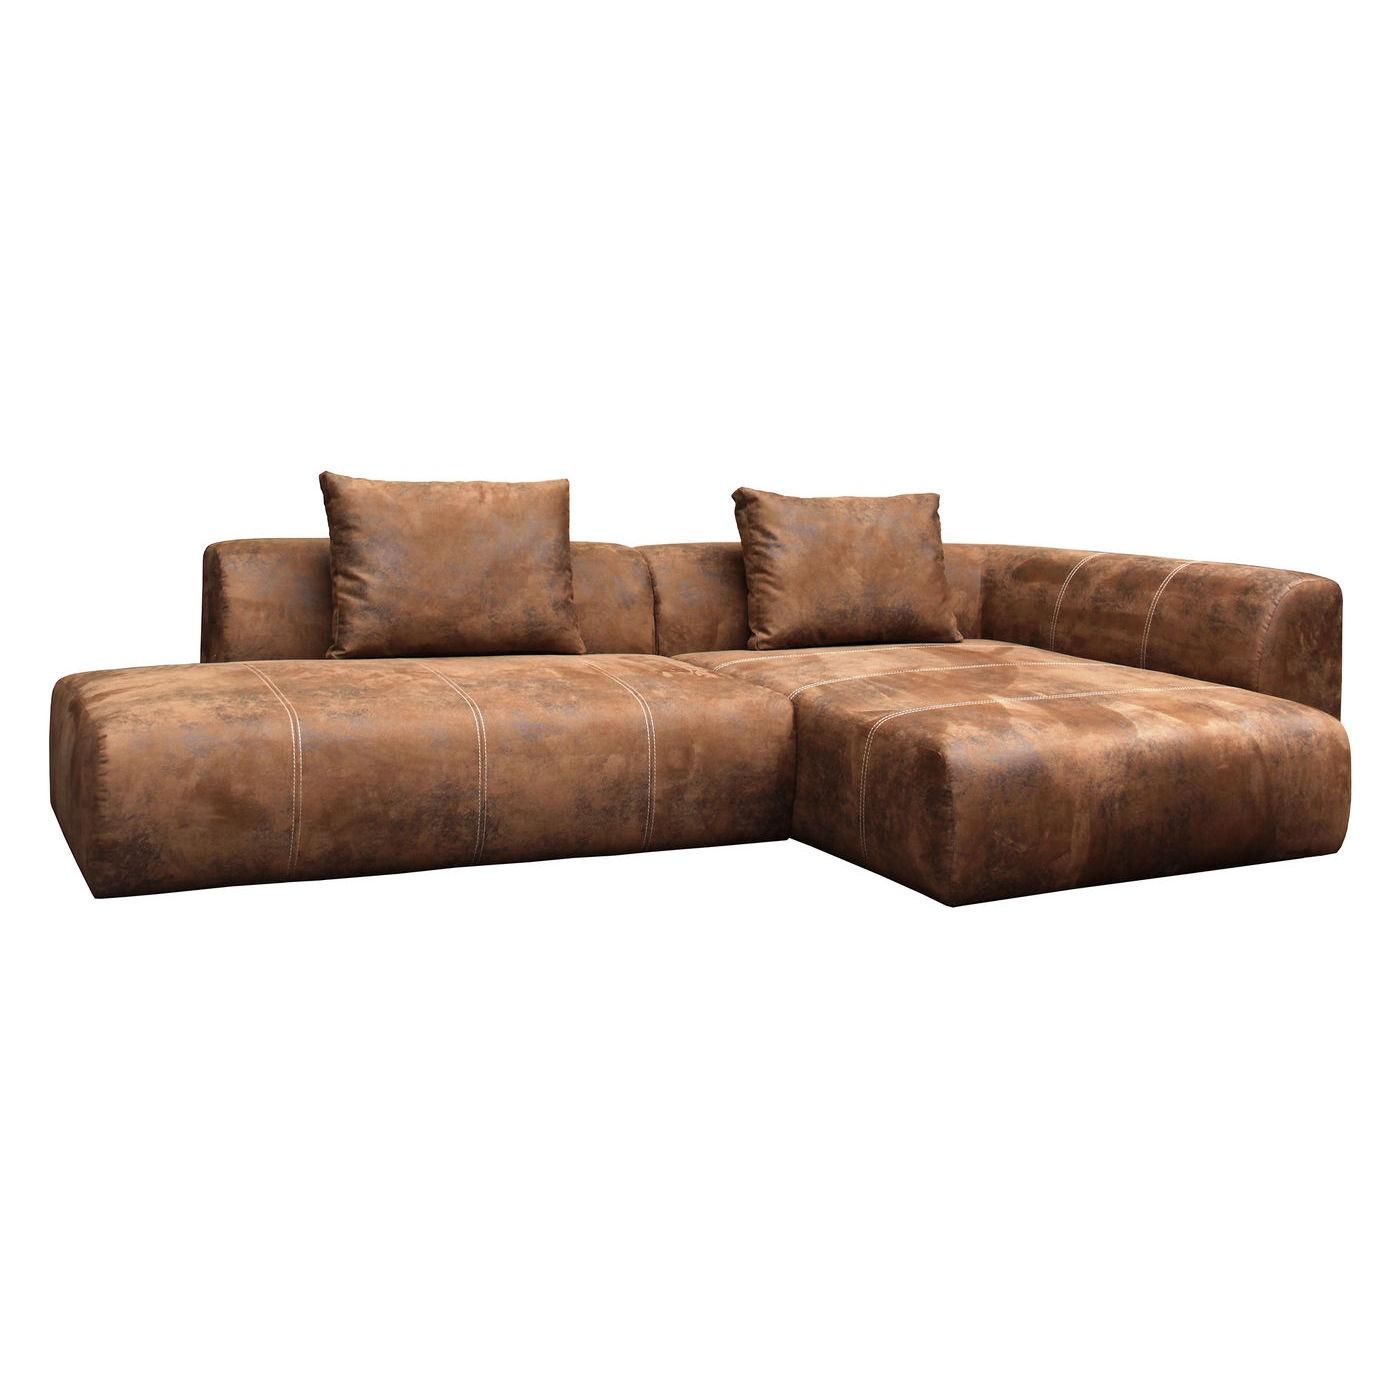 Full Size of Kare Sofa Dschinn Couch Gianni Bed Design Infinity Samt Proud Leder Furniture Sale Sales List Quik Beziehen Schilling In L Form Erpo Blau Freistil Kunstleder Sofa Kare Sofa